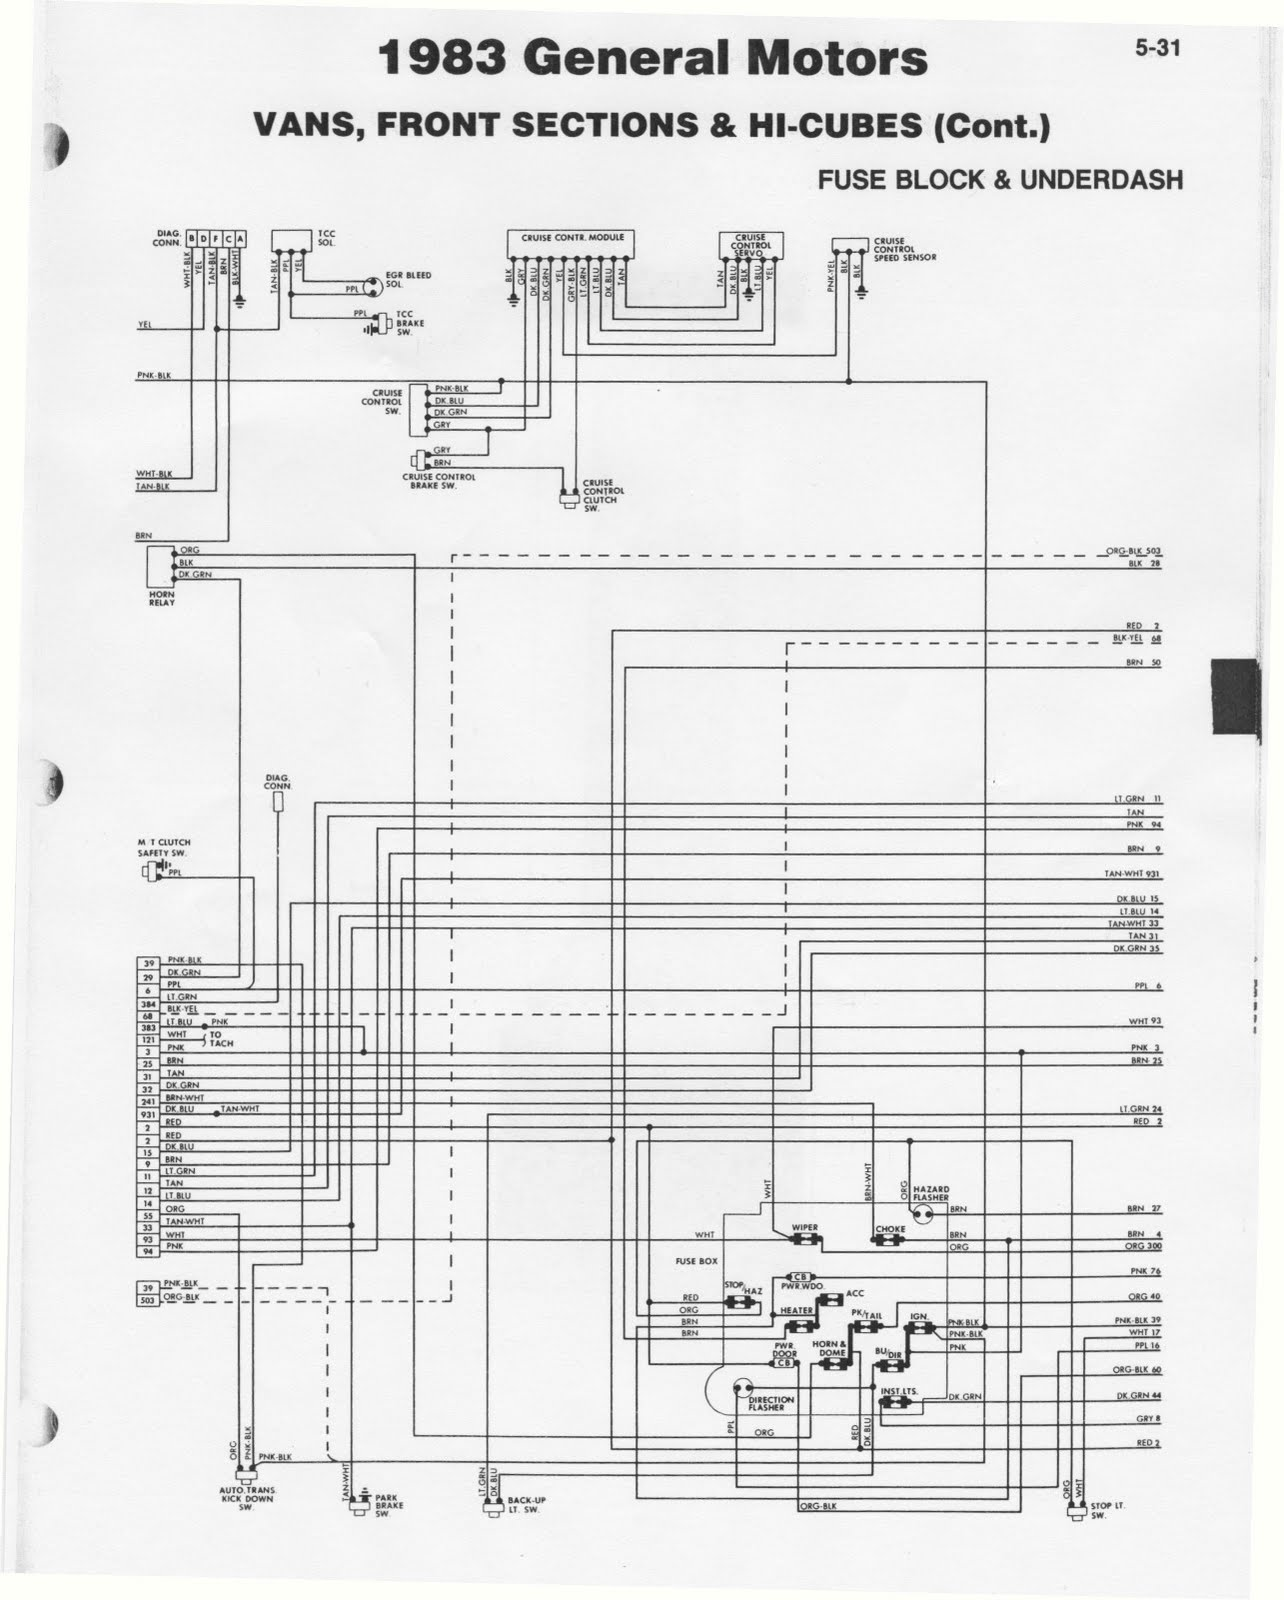 1995 fleetwood southwind rv wiring diagram 1994 fleetwood 1998 georgie boy wiring diagram landau georgie boy wiring diagram f53 [ 1284 x 1600 Pixel ]